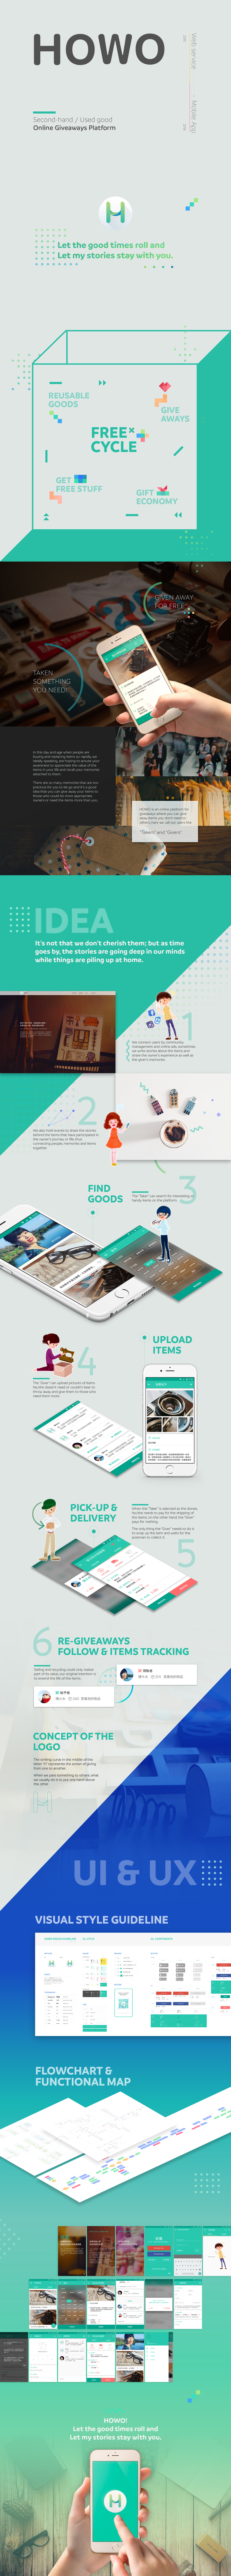 UI ux app mobile Web Style Guide free goods flowchart shop Ecommerce